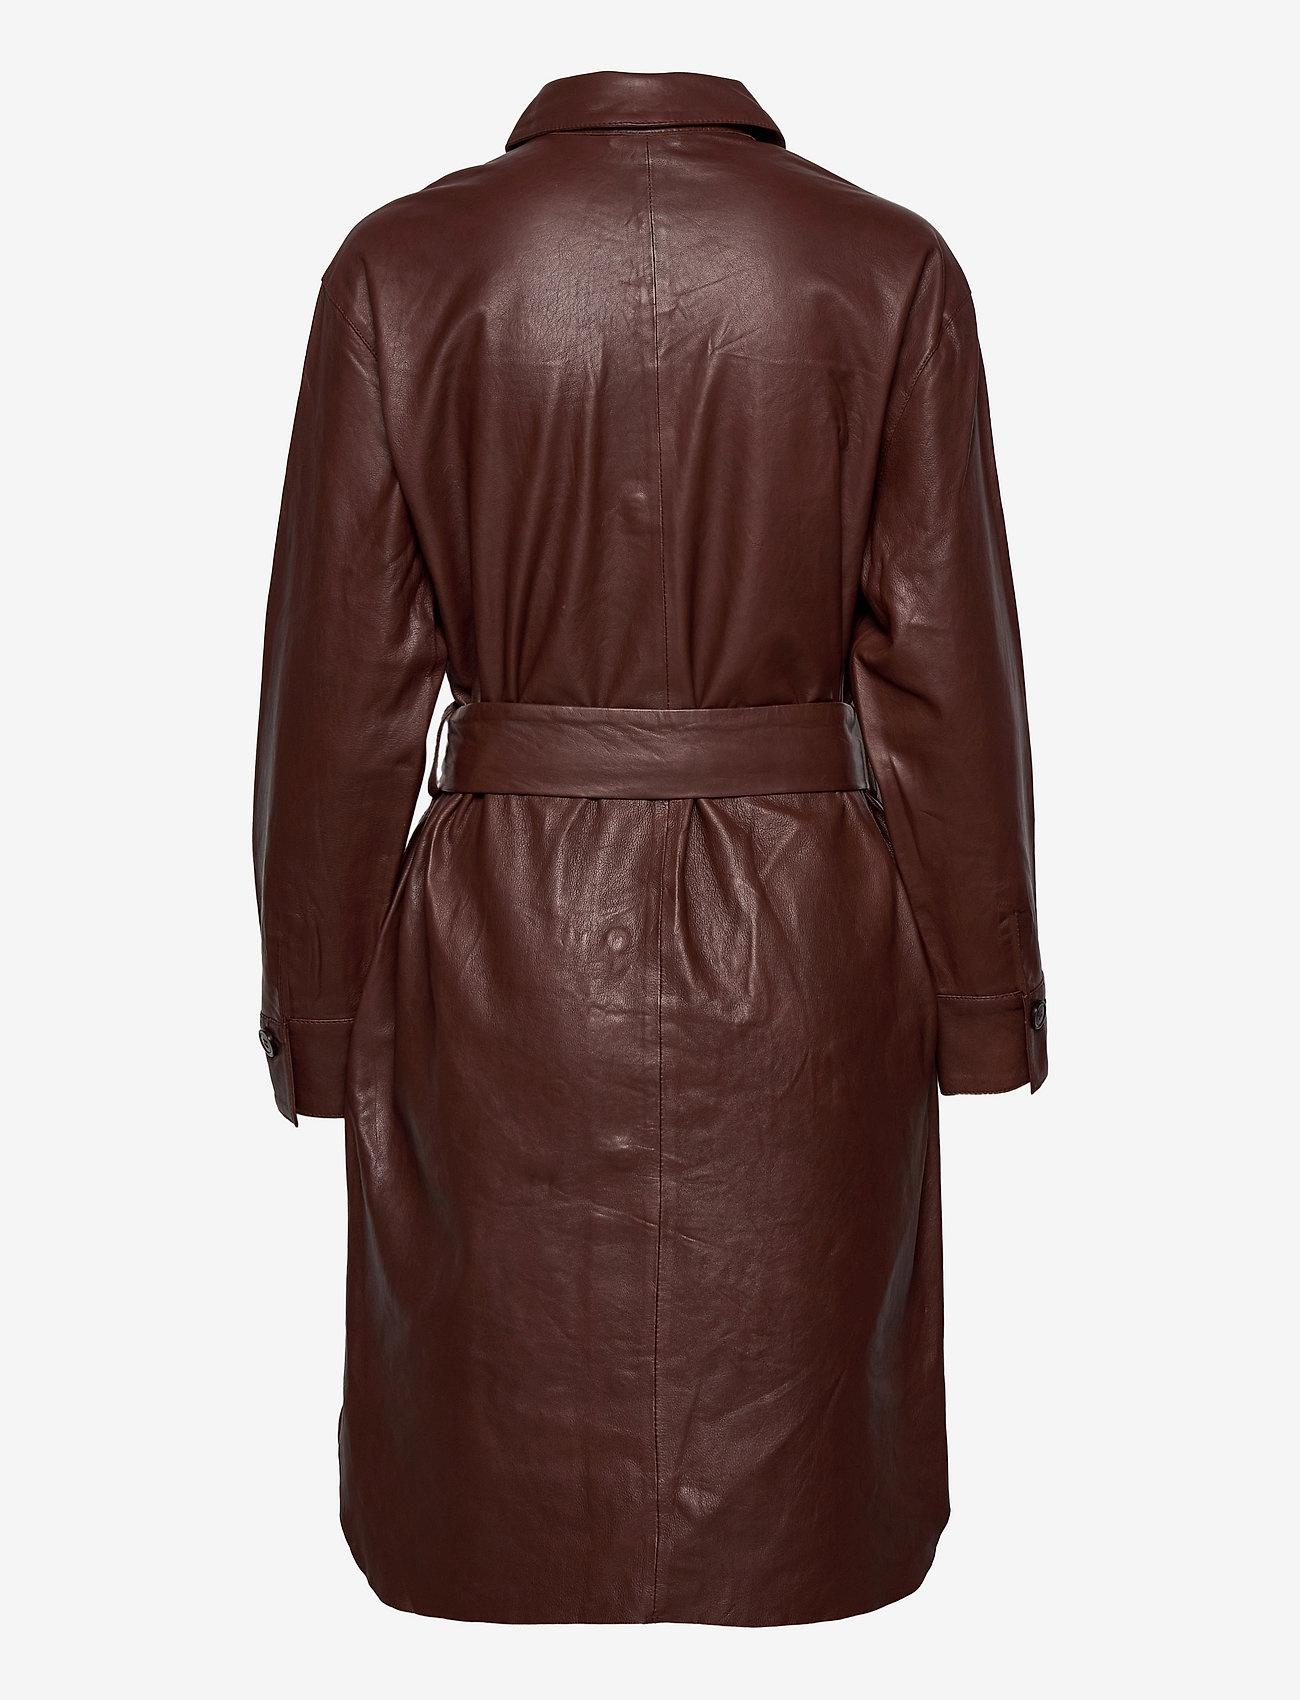 Saint Tropez Dames leer jurk, rood